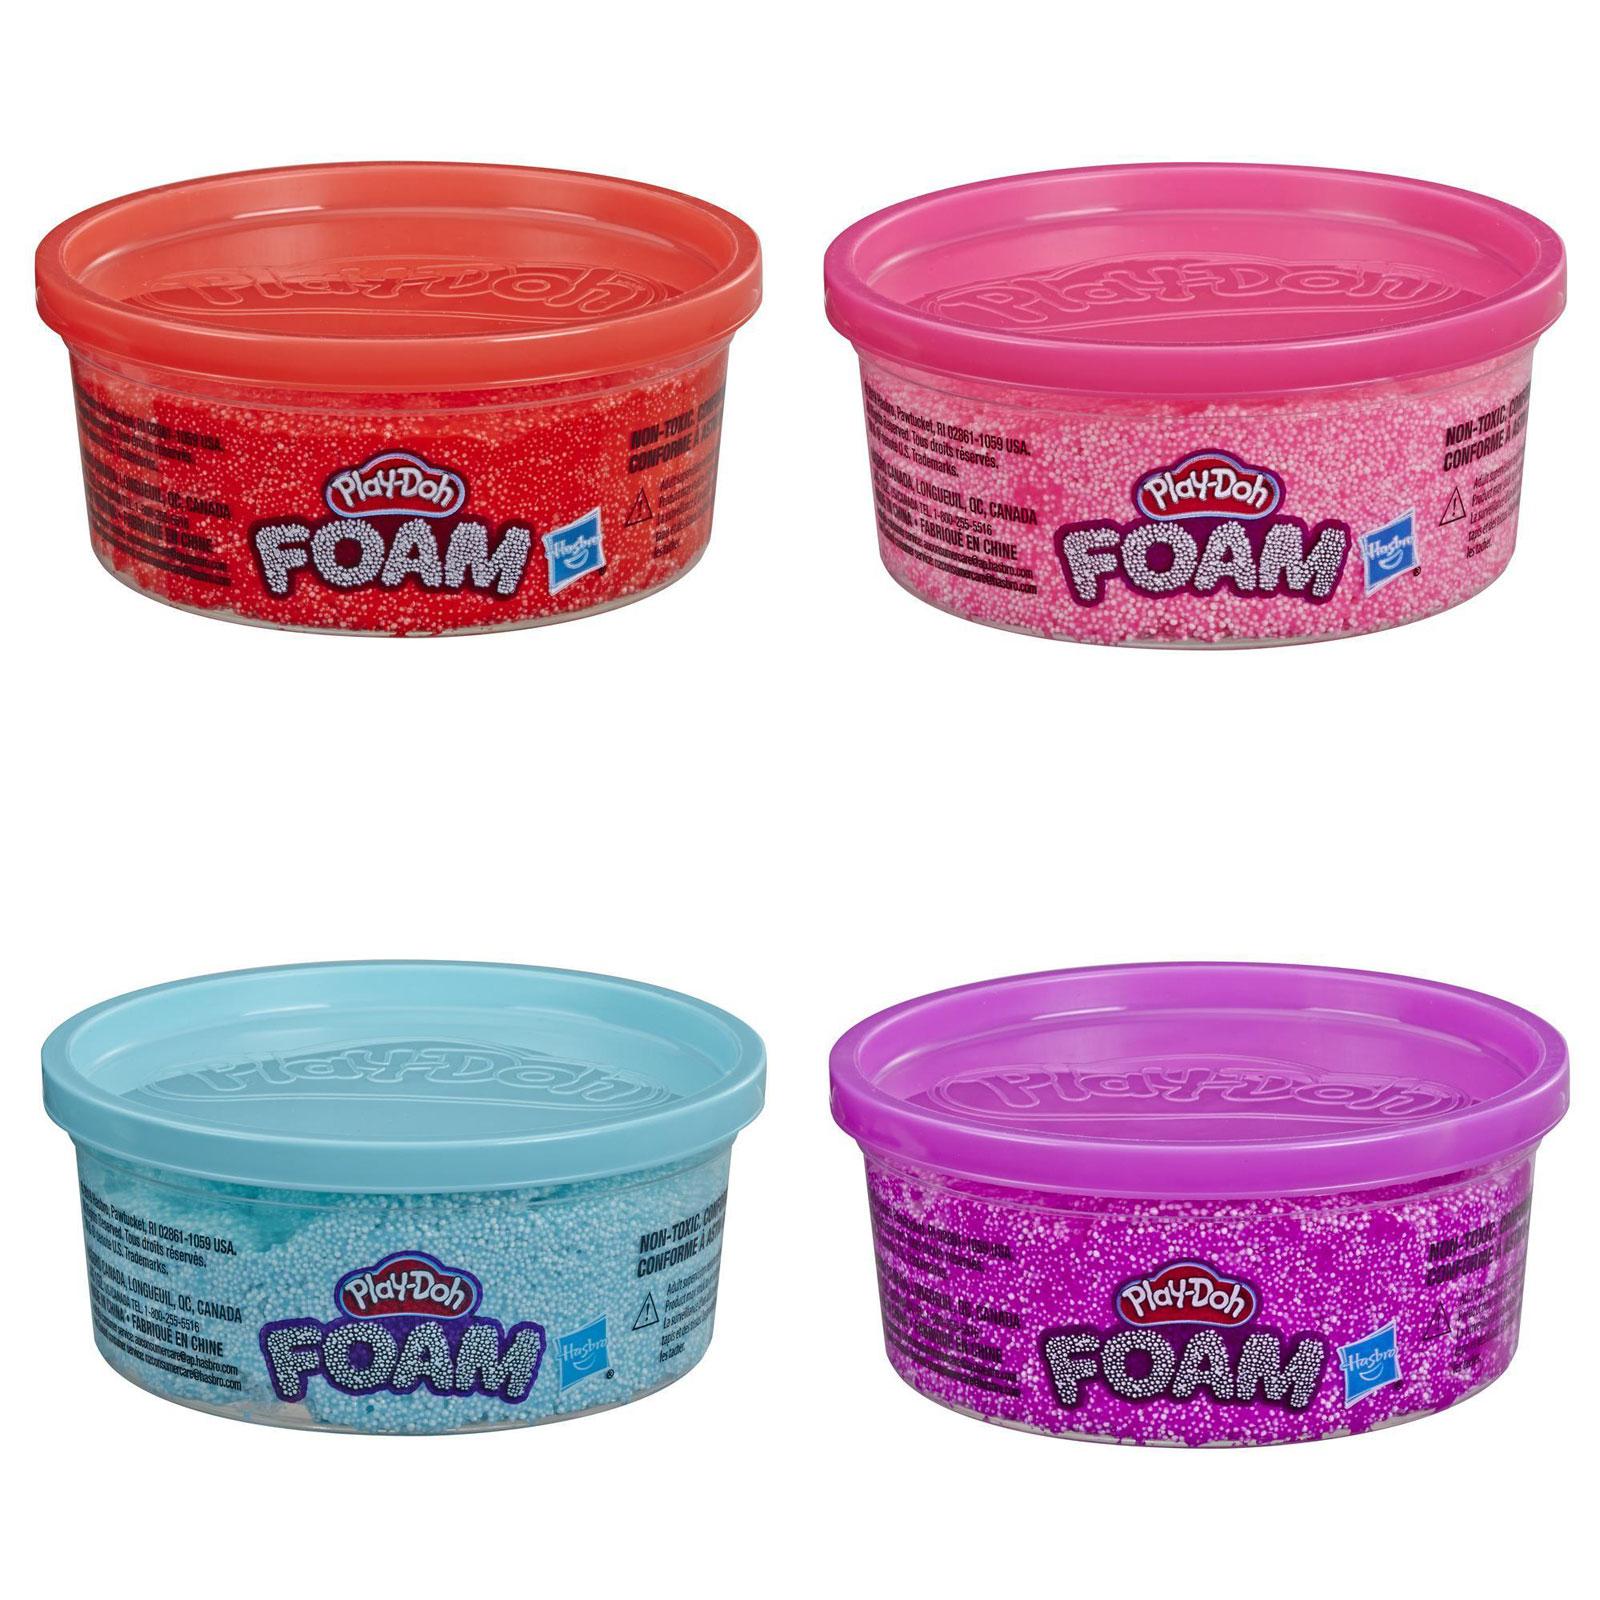 Playdoh-Foam